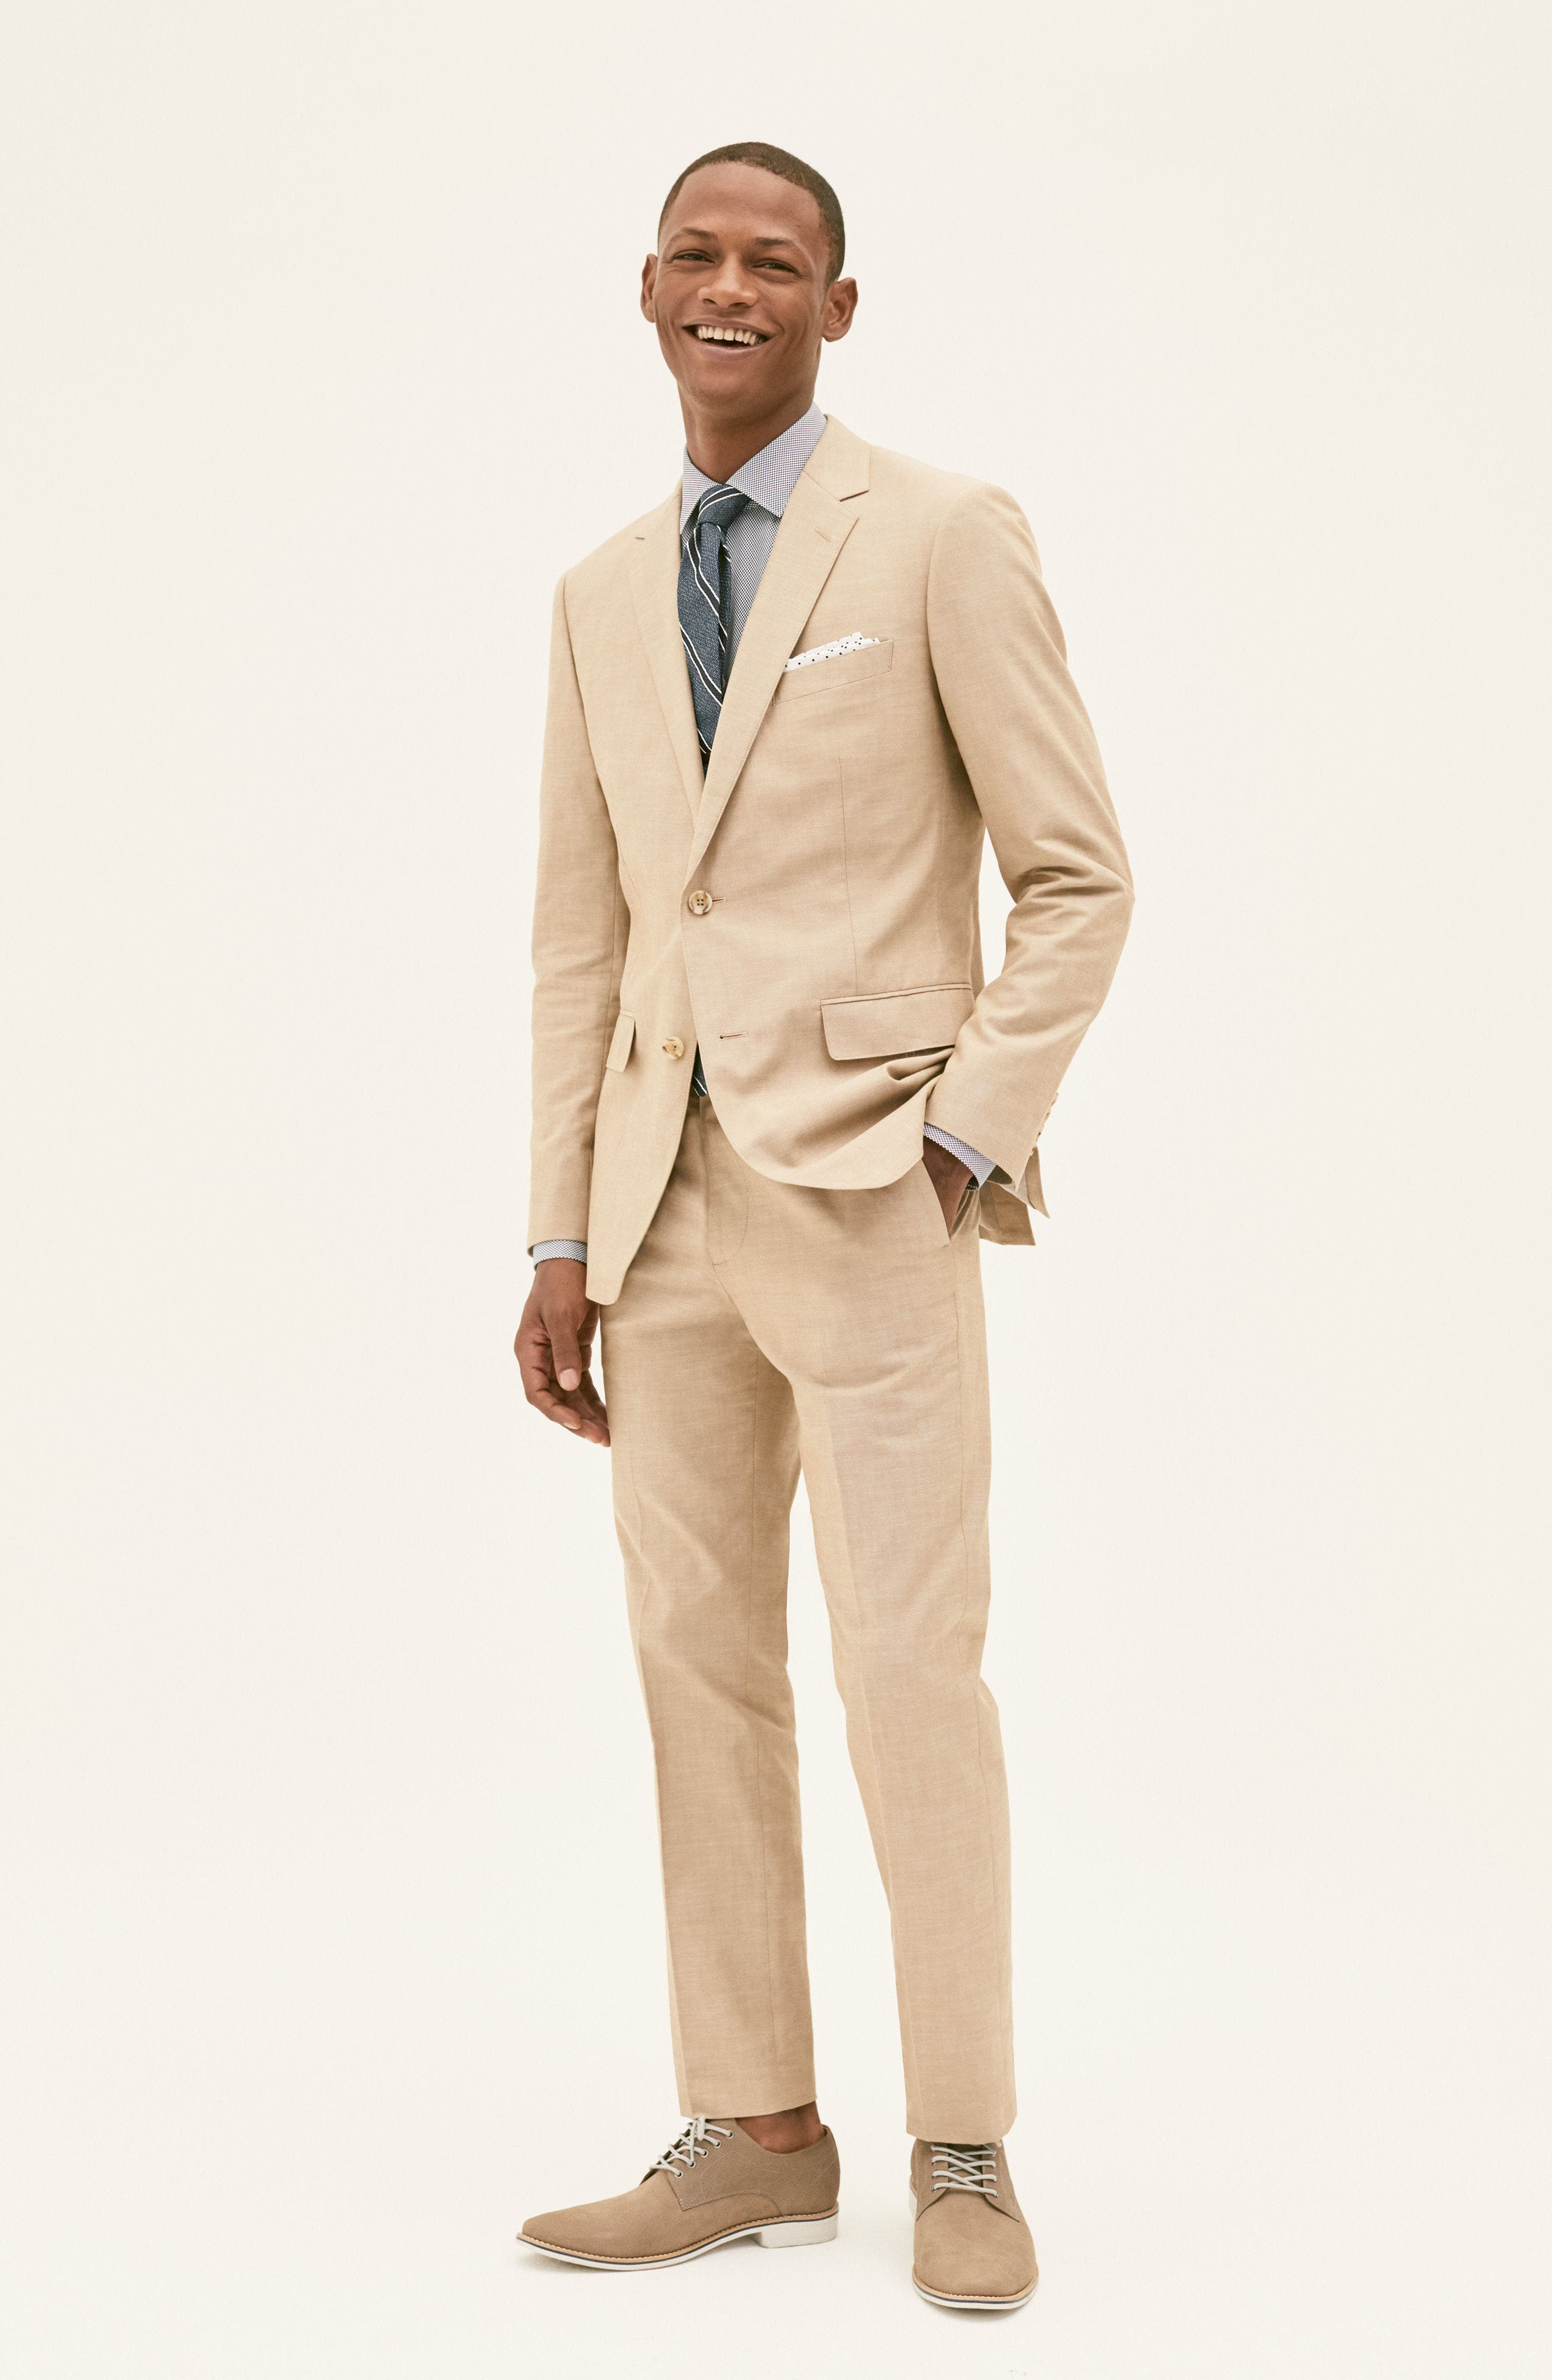 BONOBOS, Slim Fit Chambray Cotton Blazer, Alternate thumbnail 7, color, SOLID BLUE